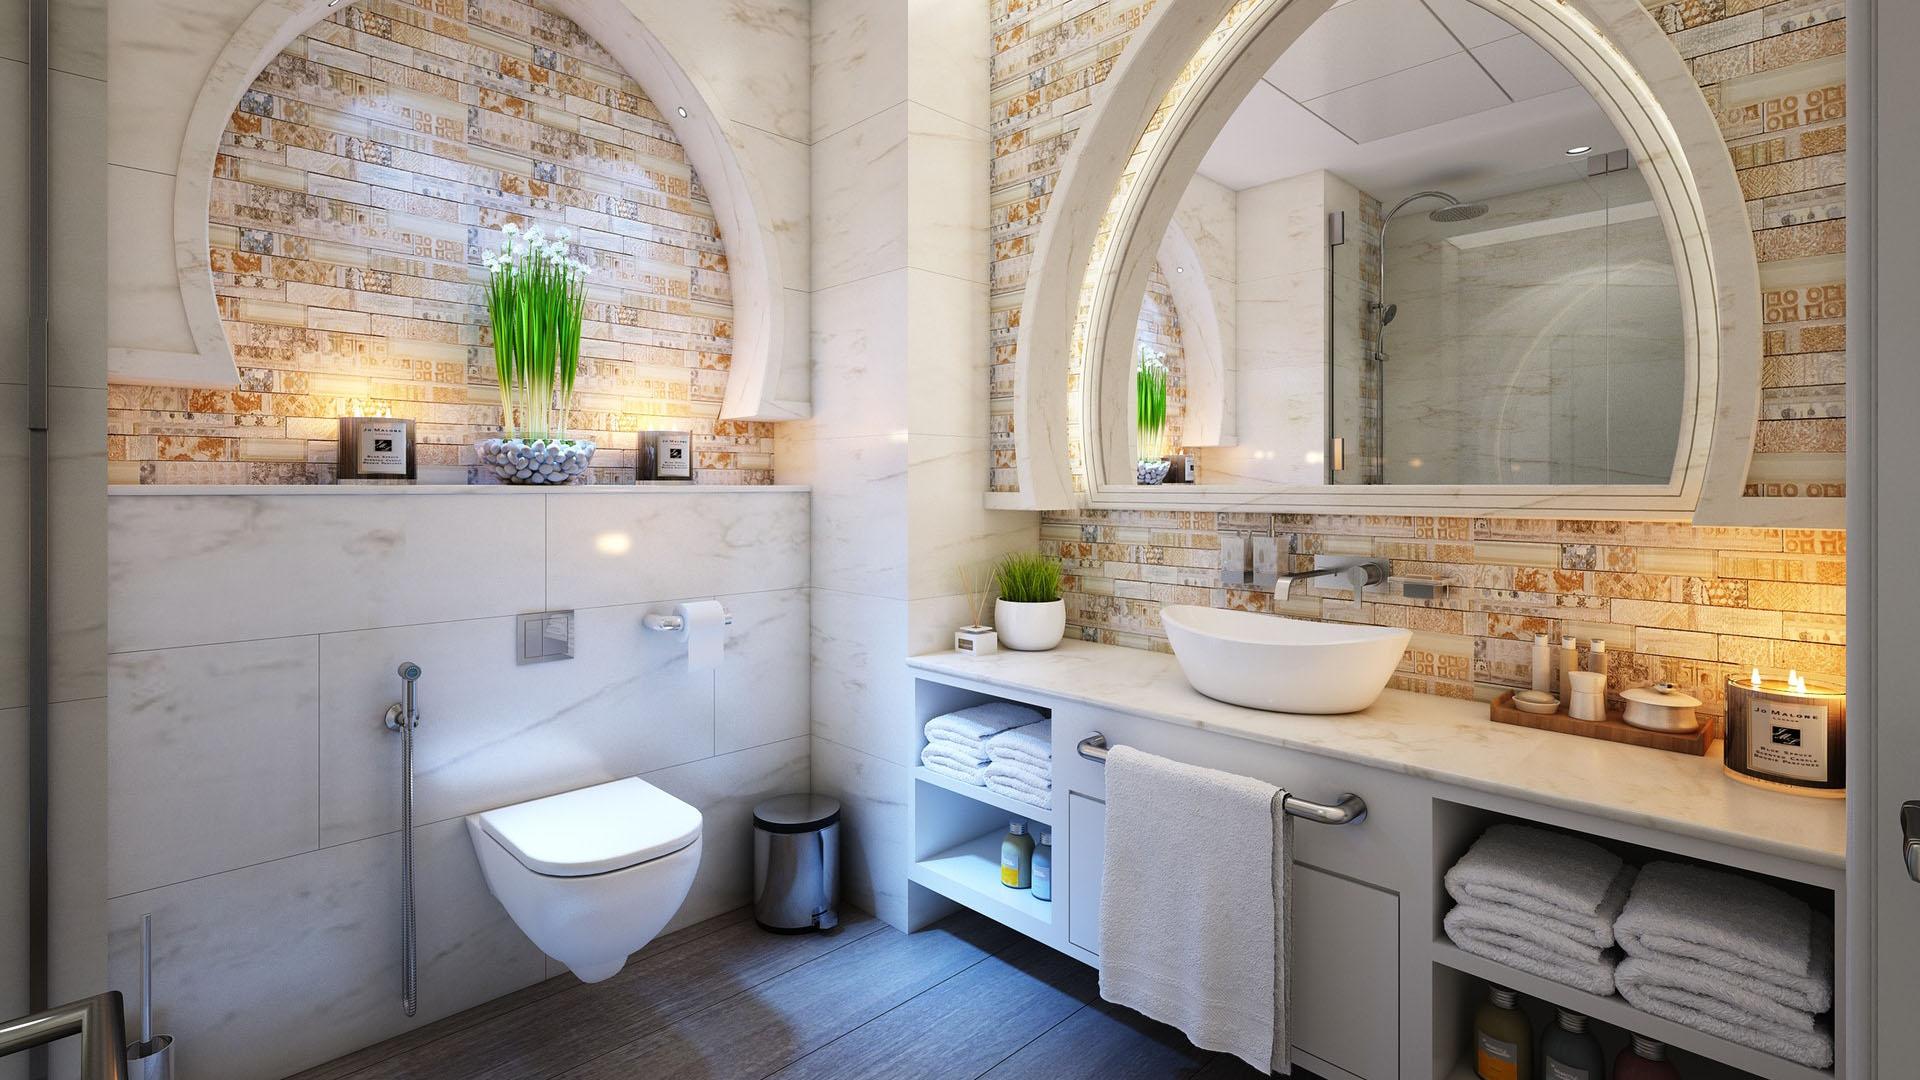 Badkamer Deels Betegelen : Betegelen betegelen betegelen betegelen en stucken badkamer